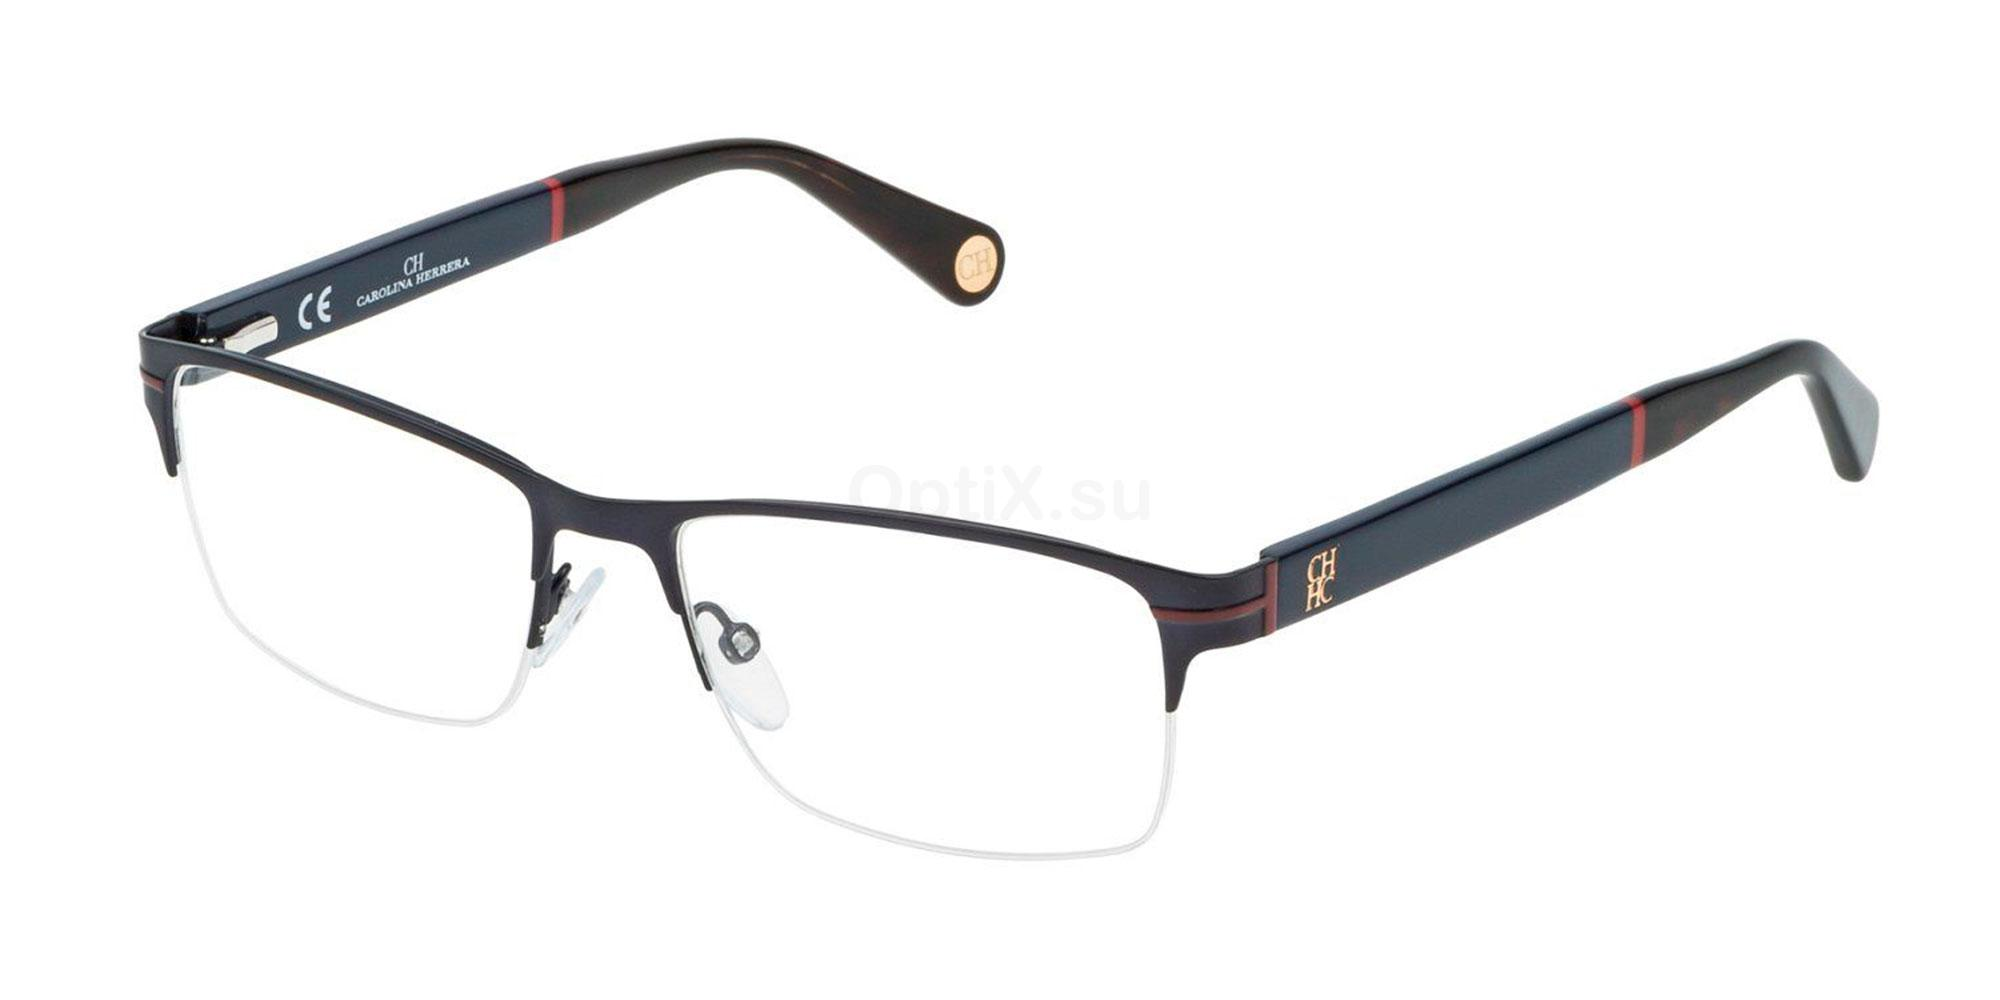 0R08 VHE055 Glasses, CH Carolina Herrera